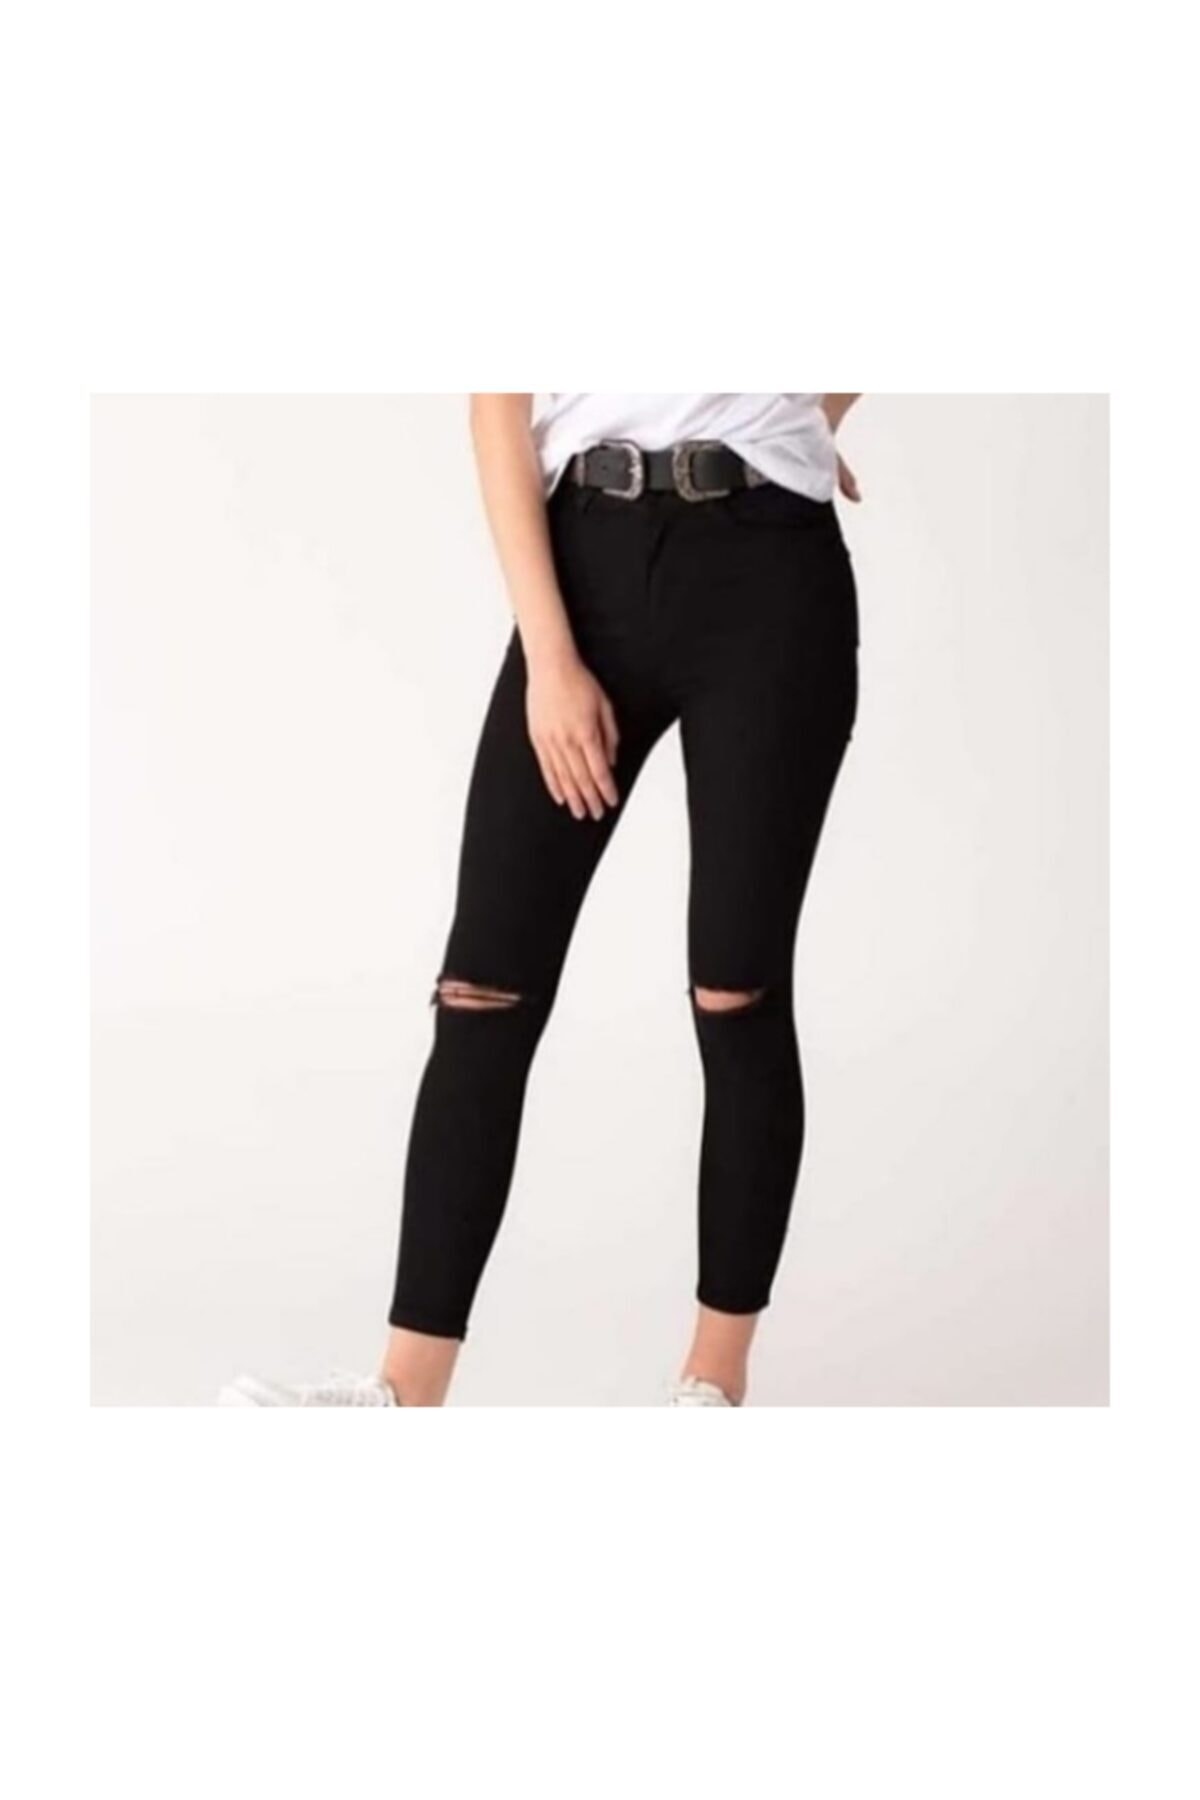 eGs Bayan Siyah Dizi Yırtık Pantolon 1